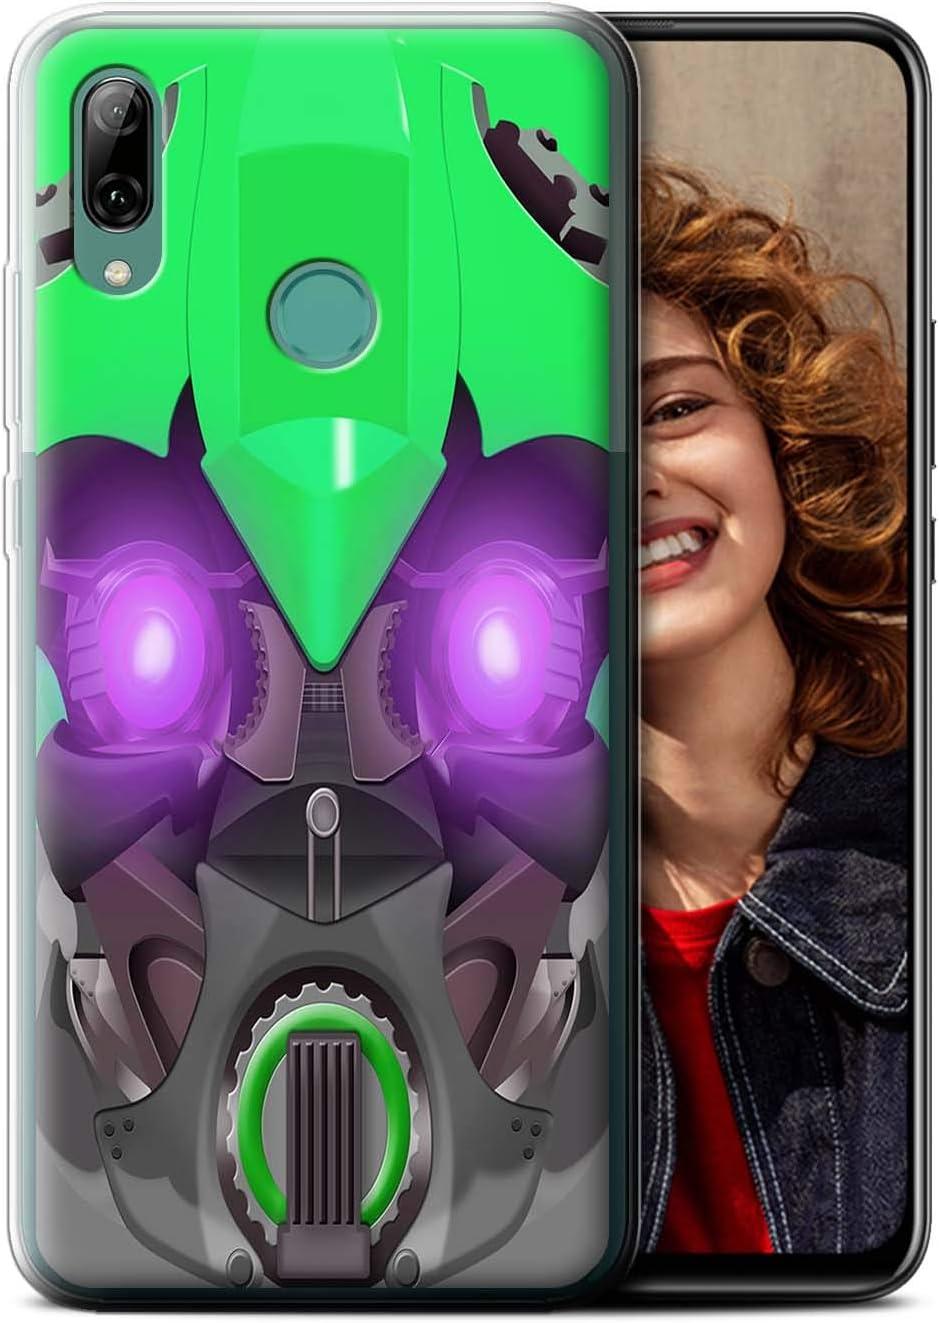 eSwish Carcasa/Funda TPU/Gel para el Huawei P Smart Z/Y9 Prime 2019 / Serie: Robots - Verde Bumble-BOT